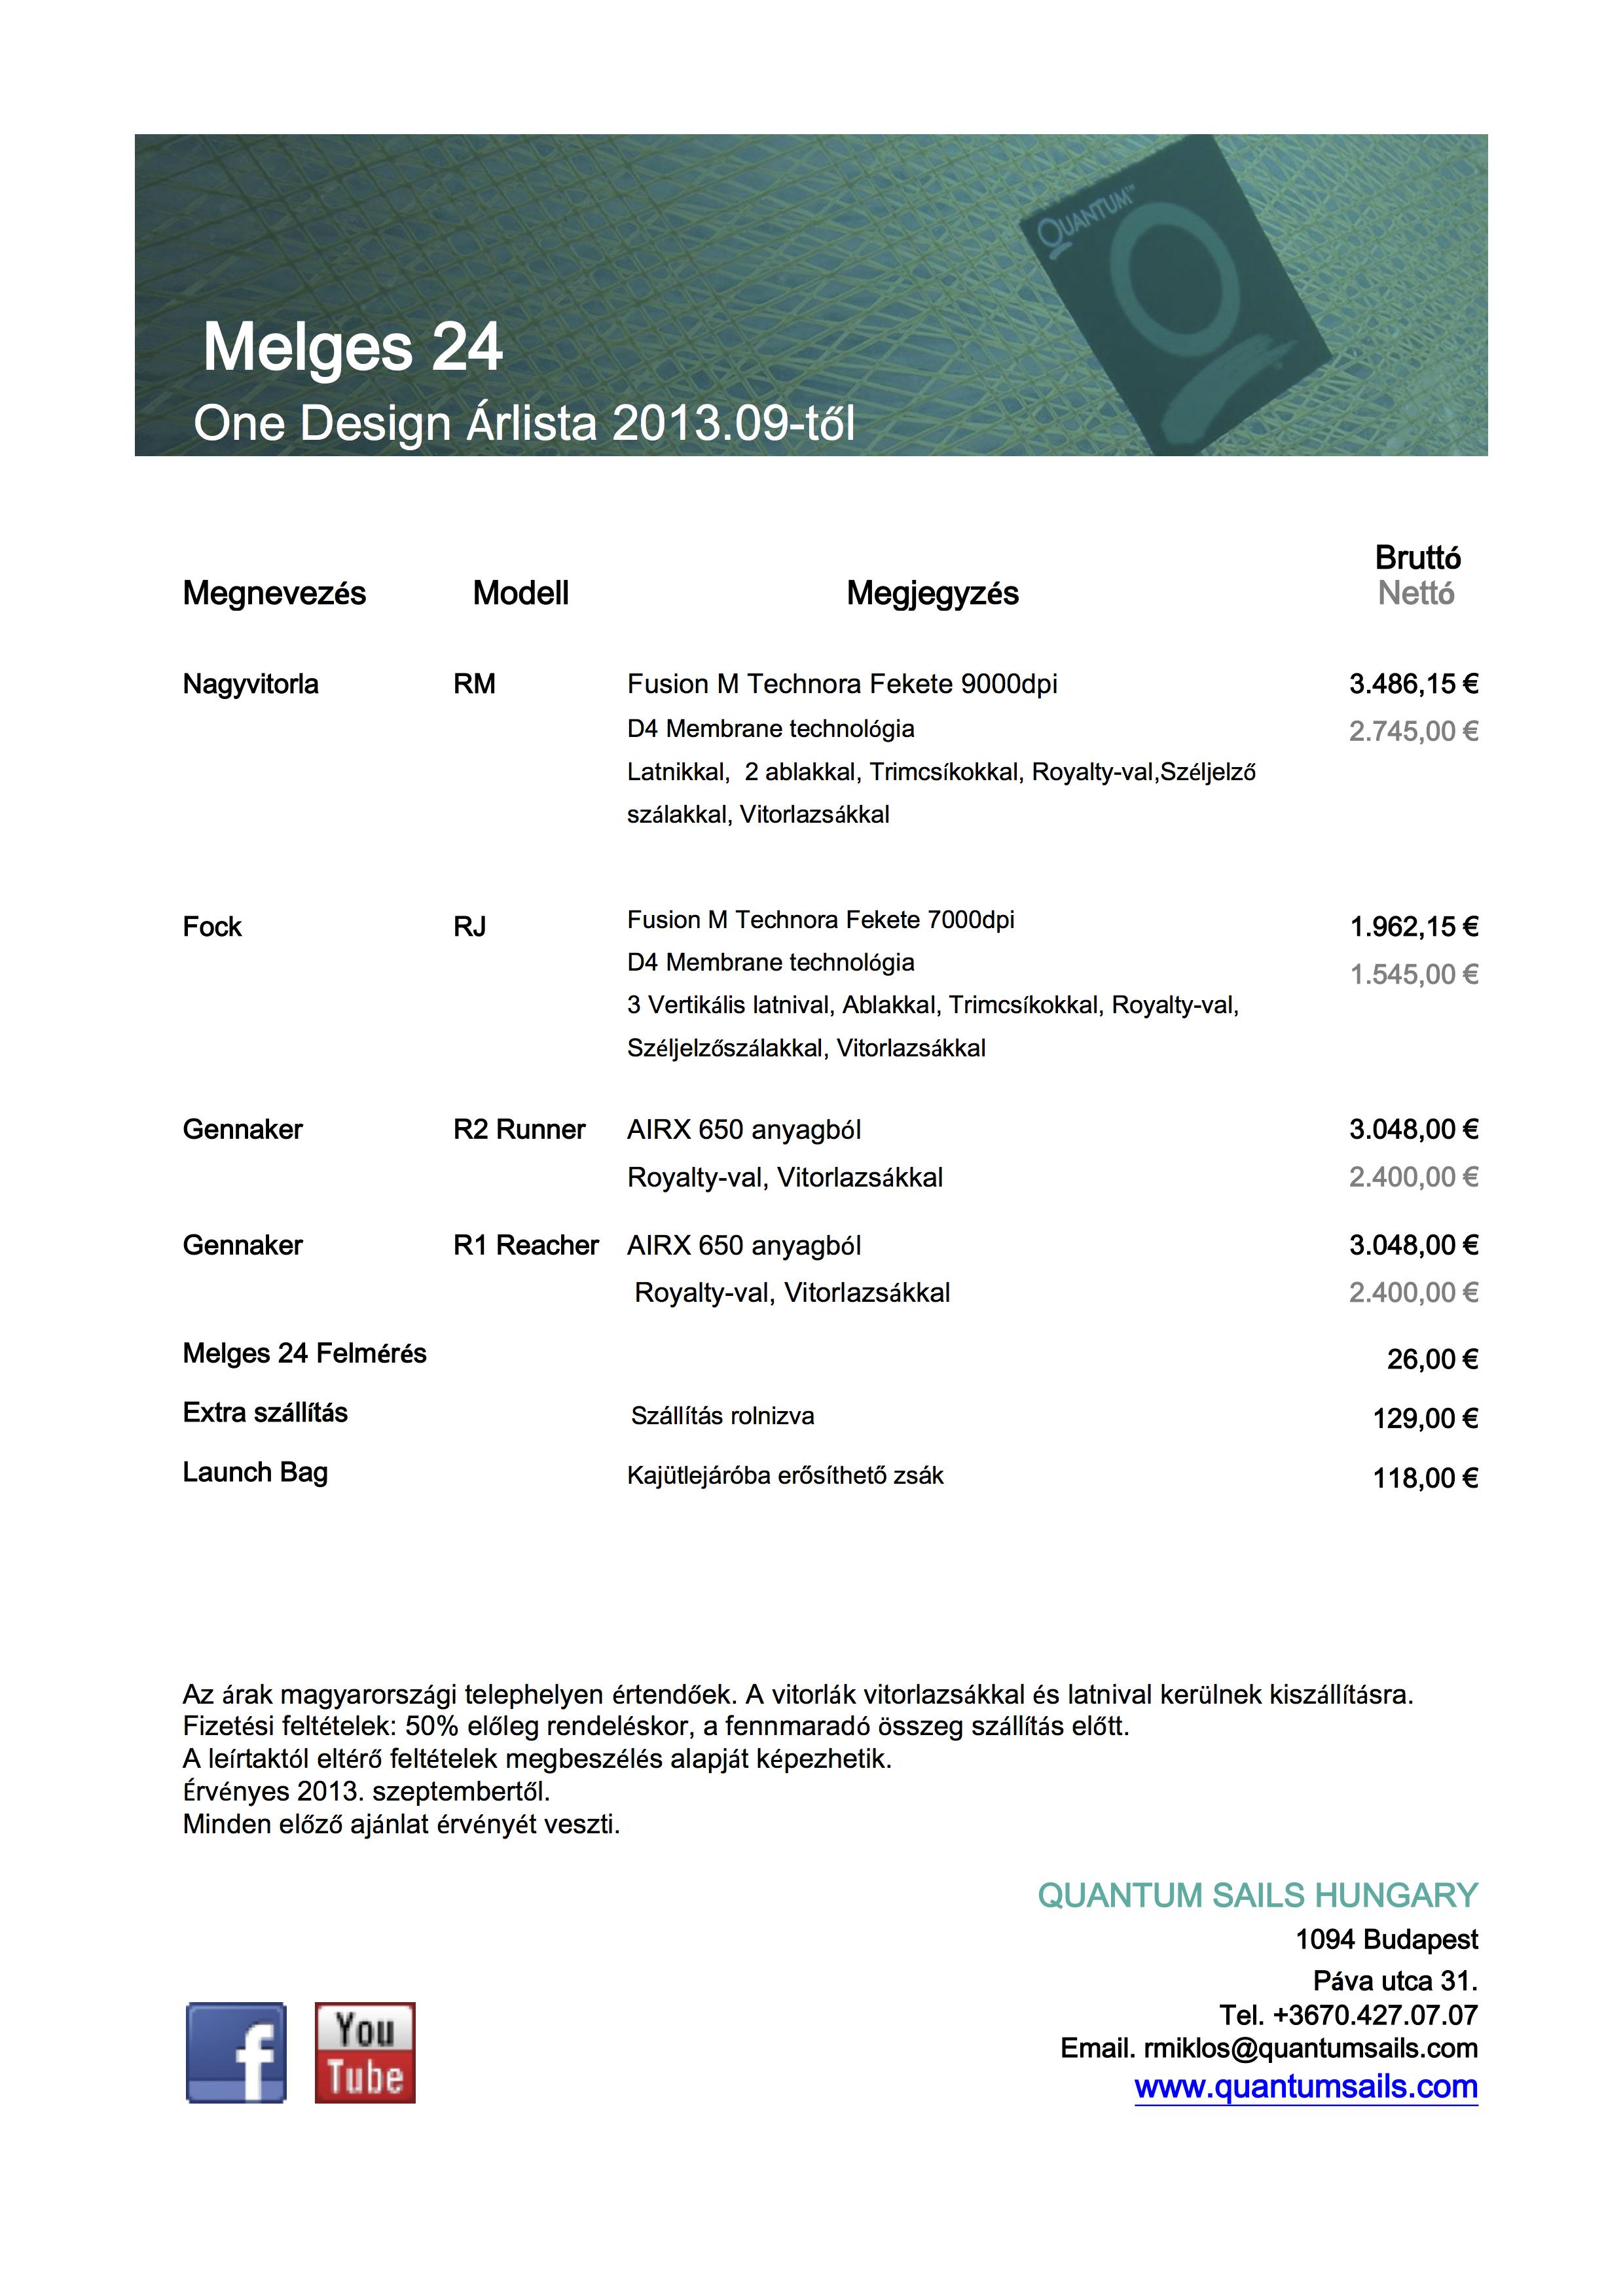 Melges_24_09.2013_Quantum_OD_HUN